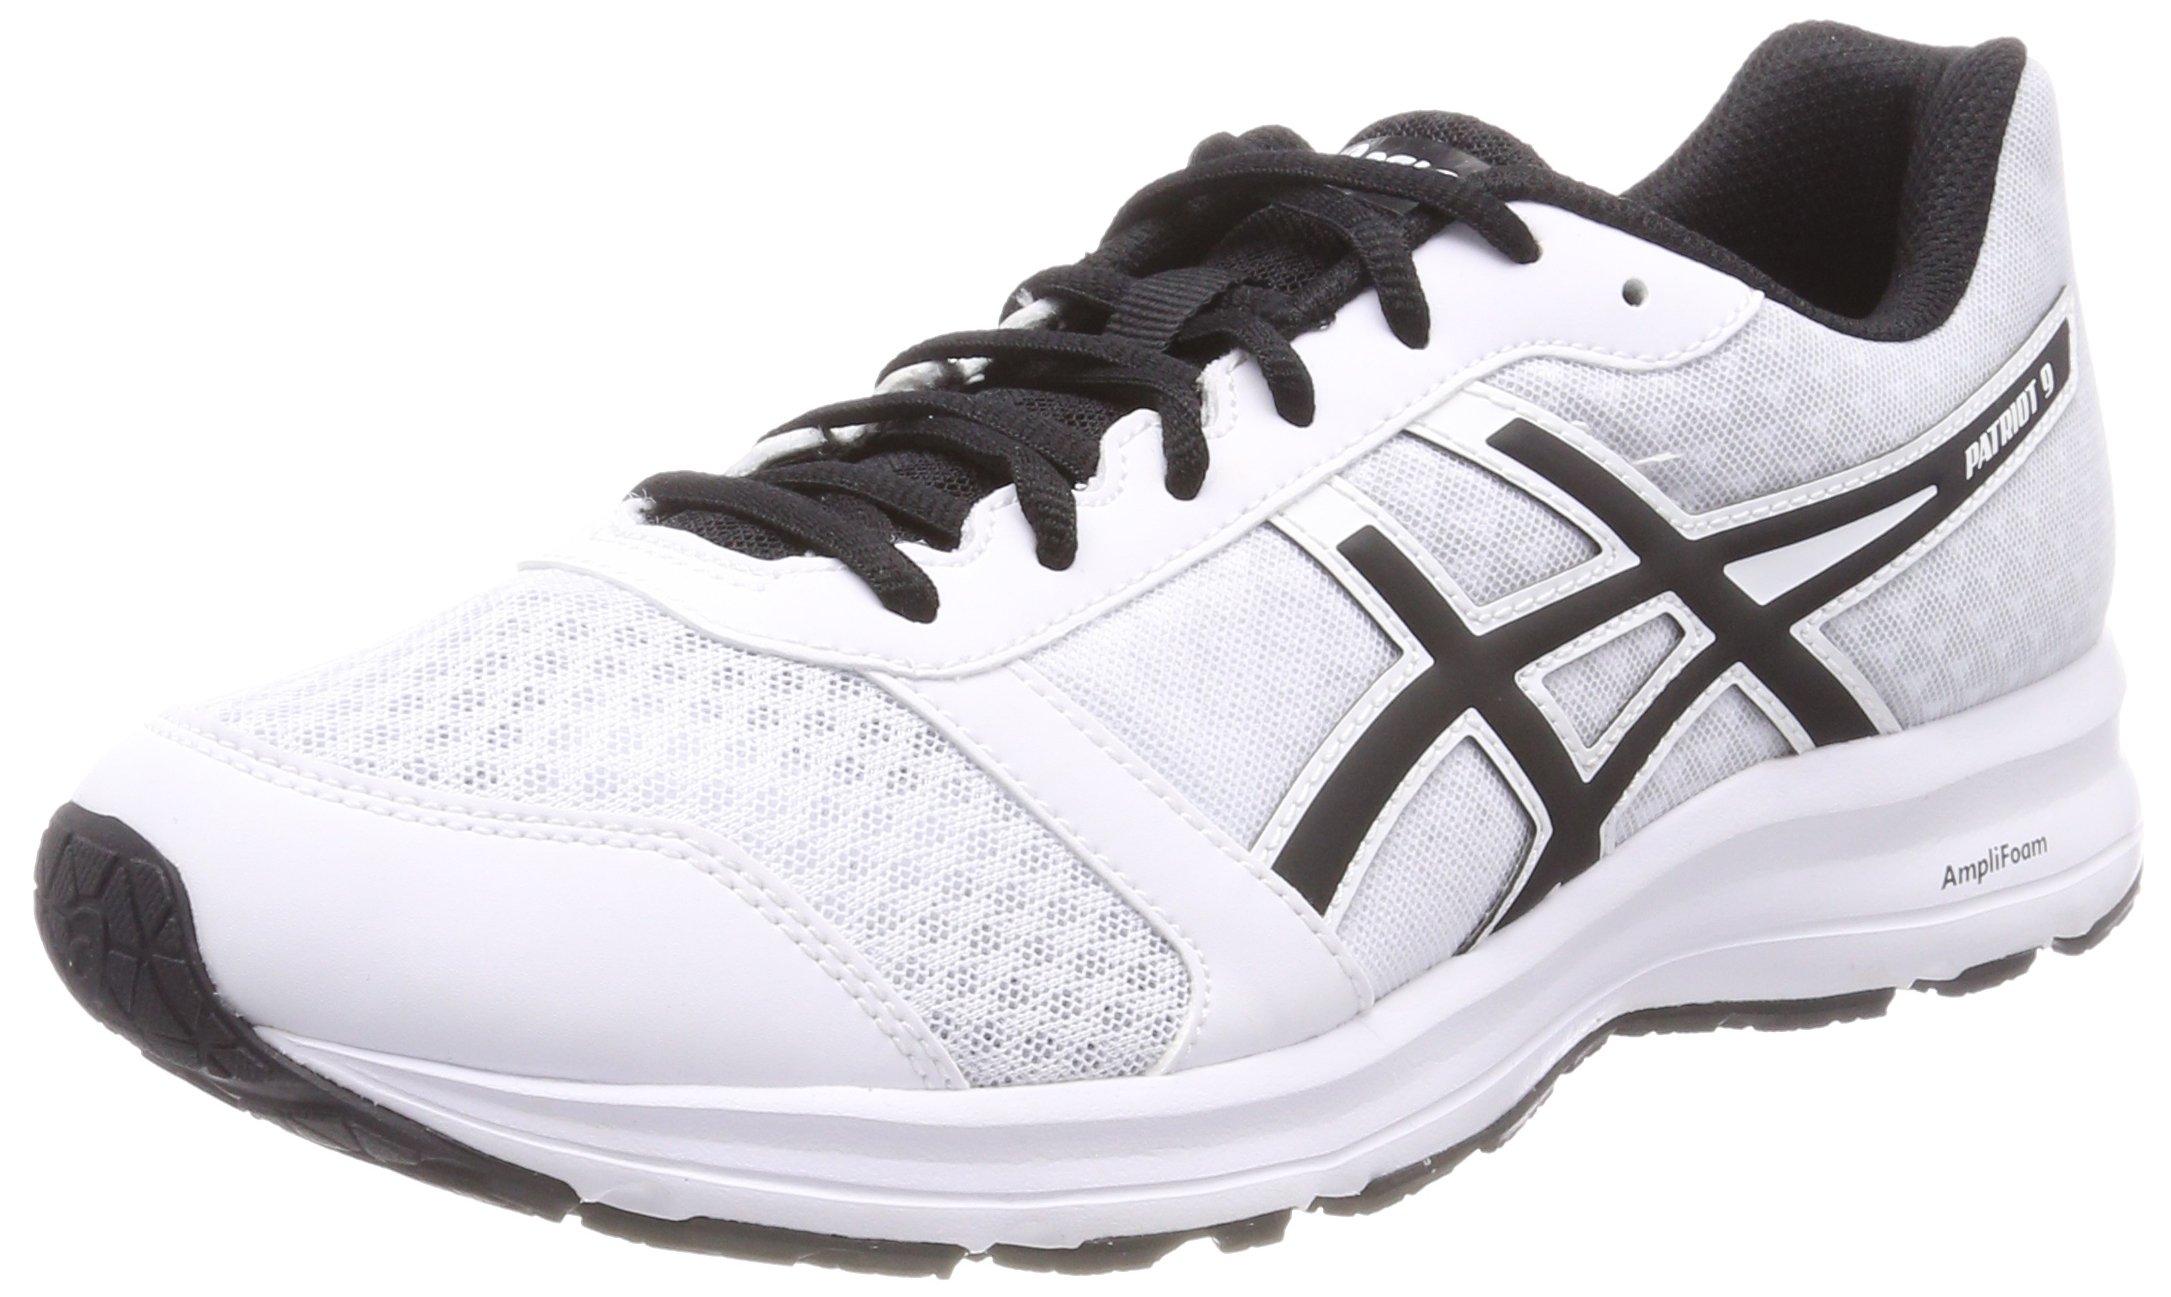 Asics Patriot 9, Zapatillas de Running para Hombre product image